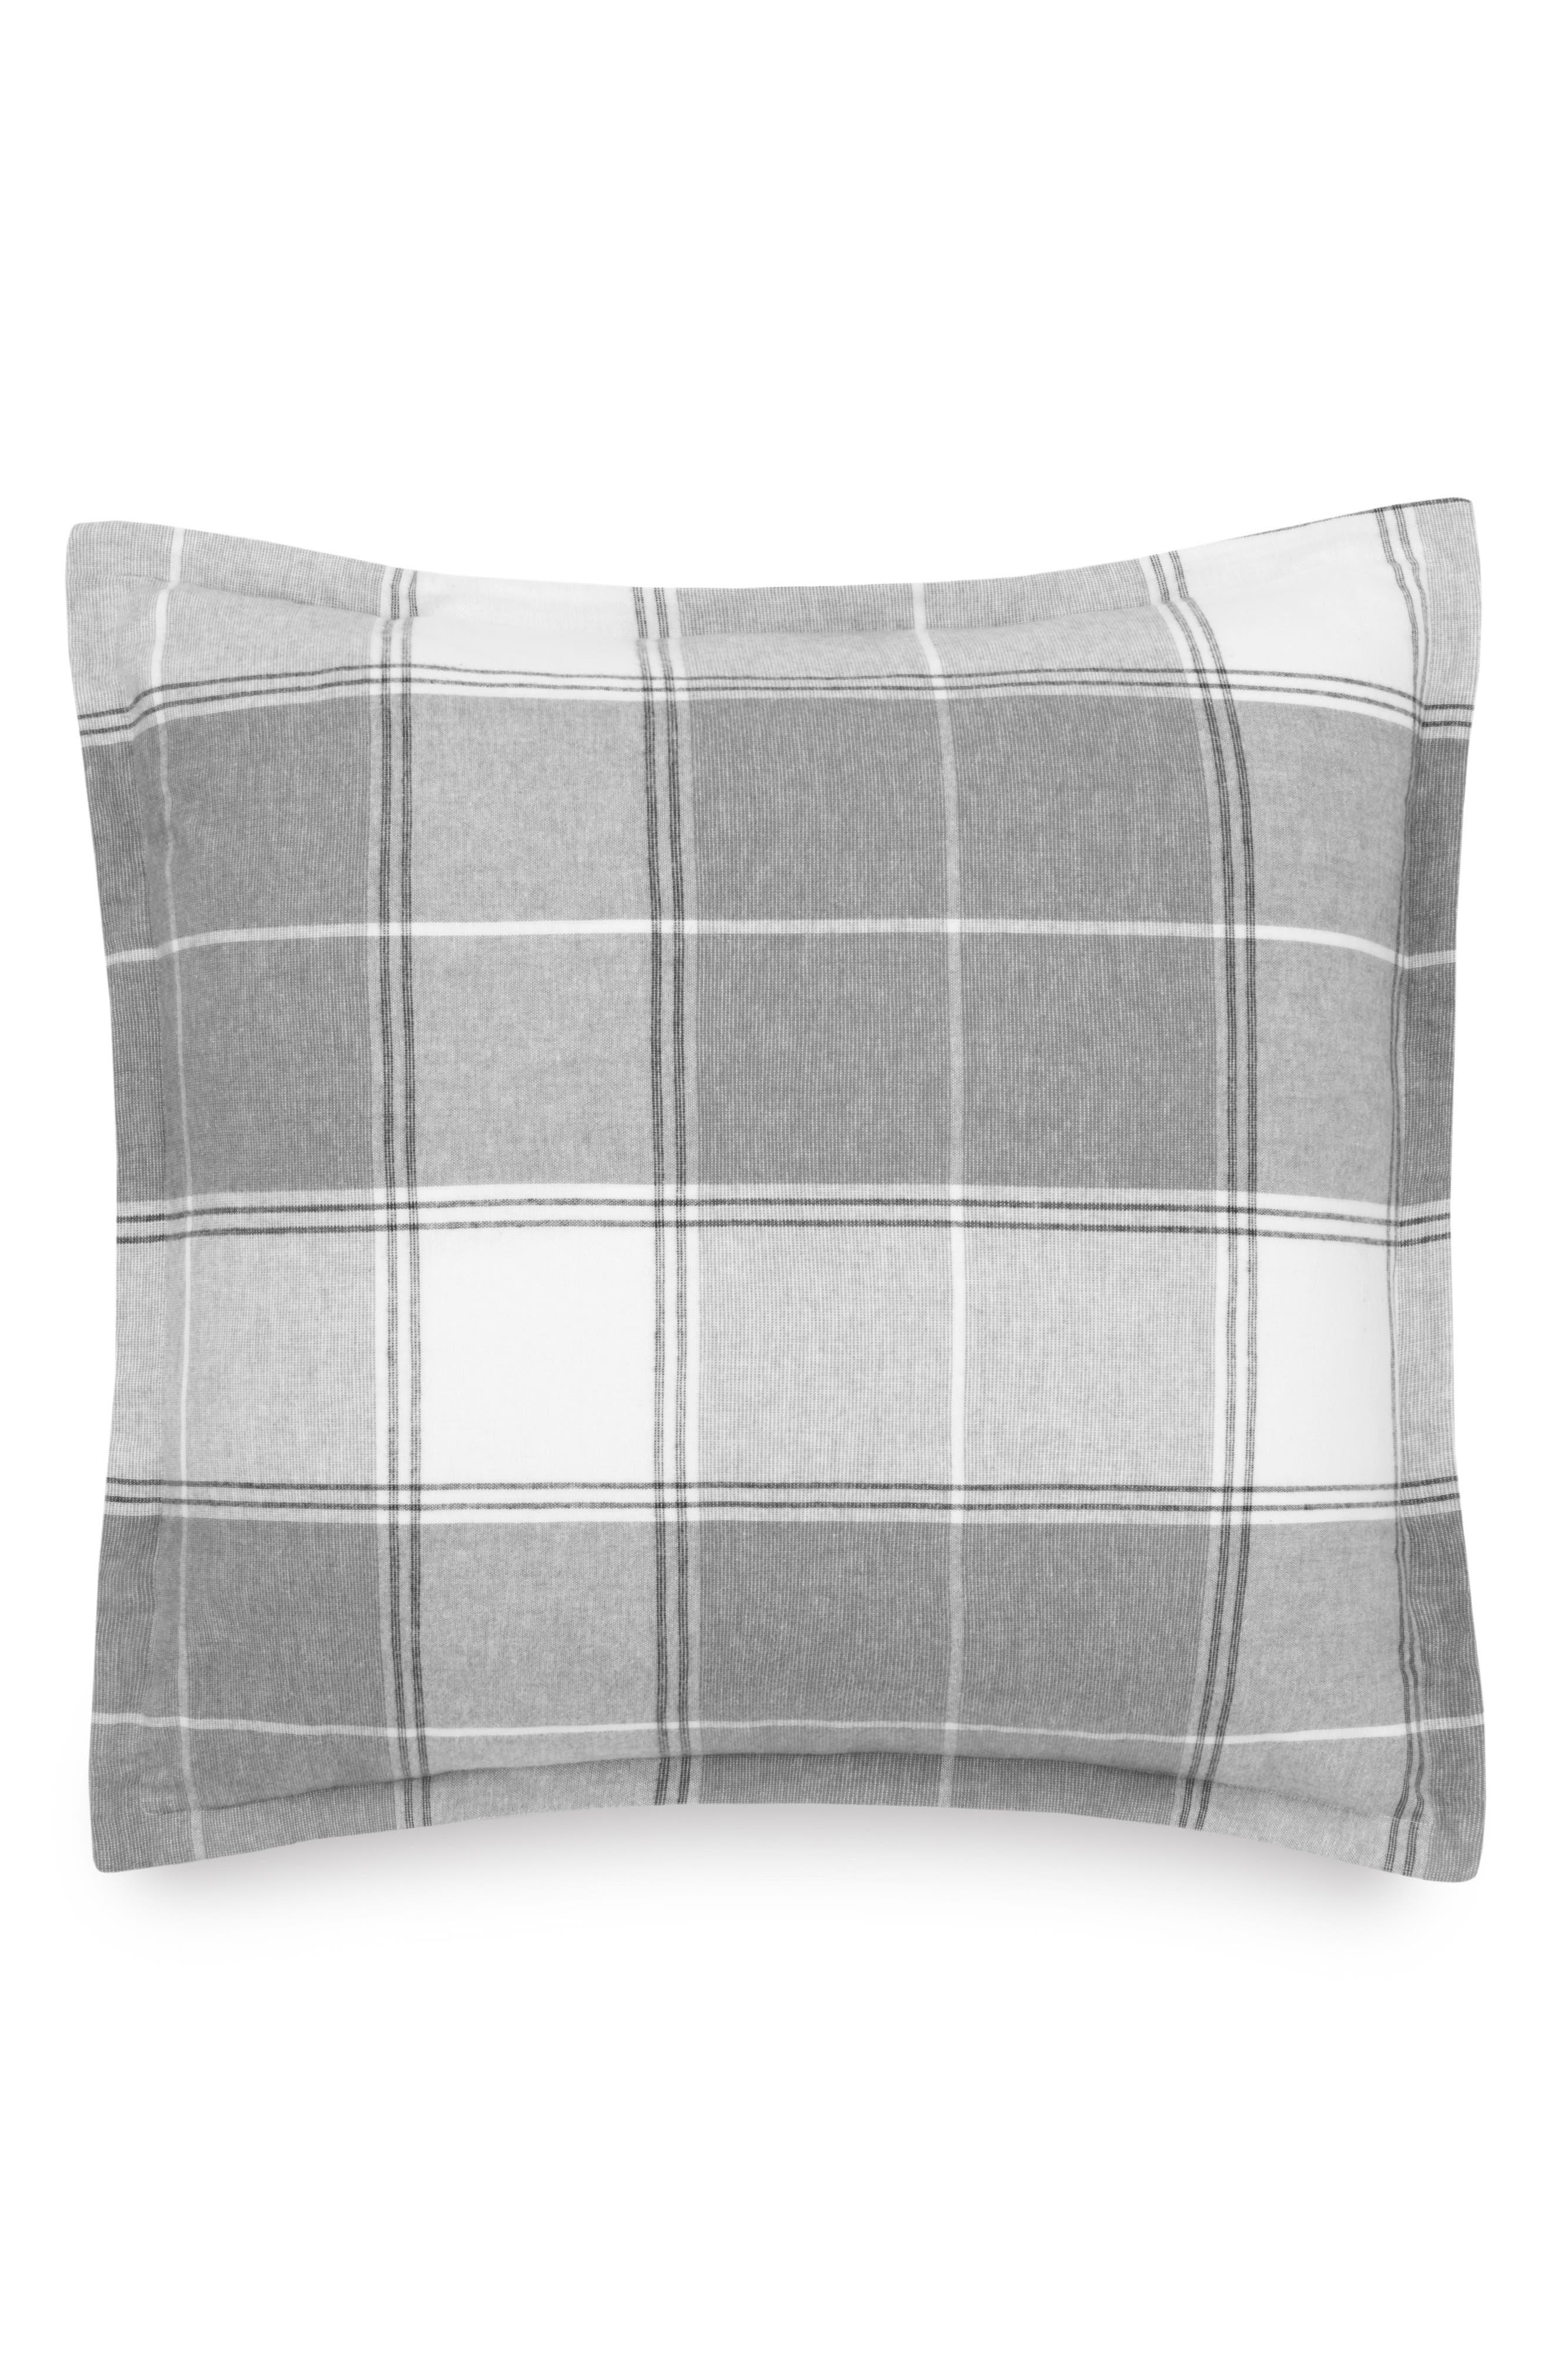 Flannel Luxe Euro Sham,                         Main,                         color,